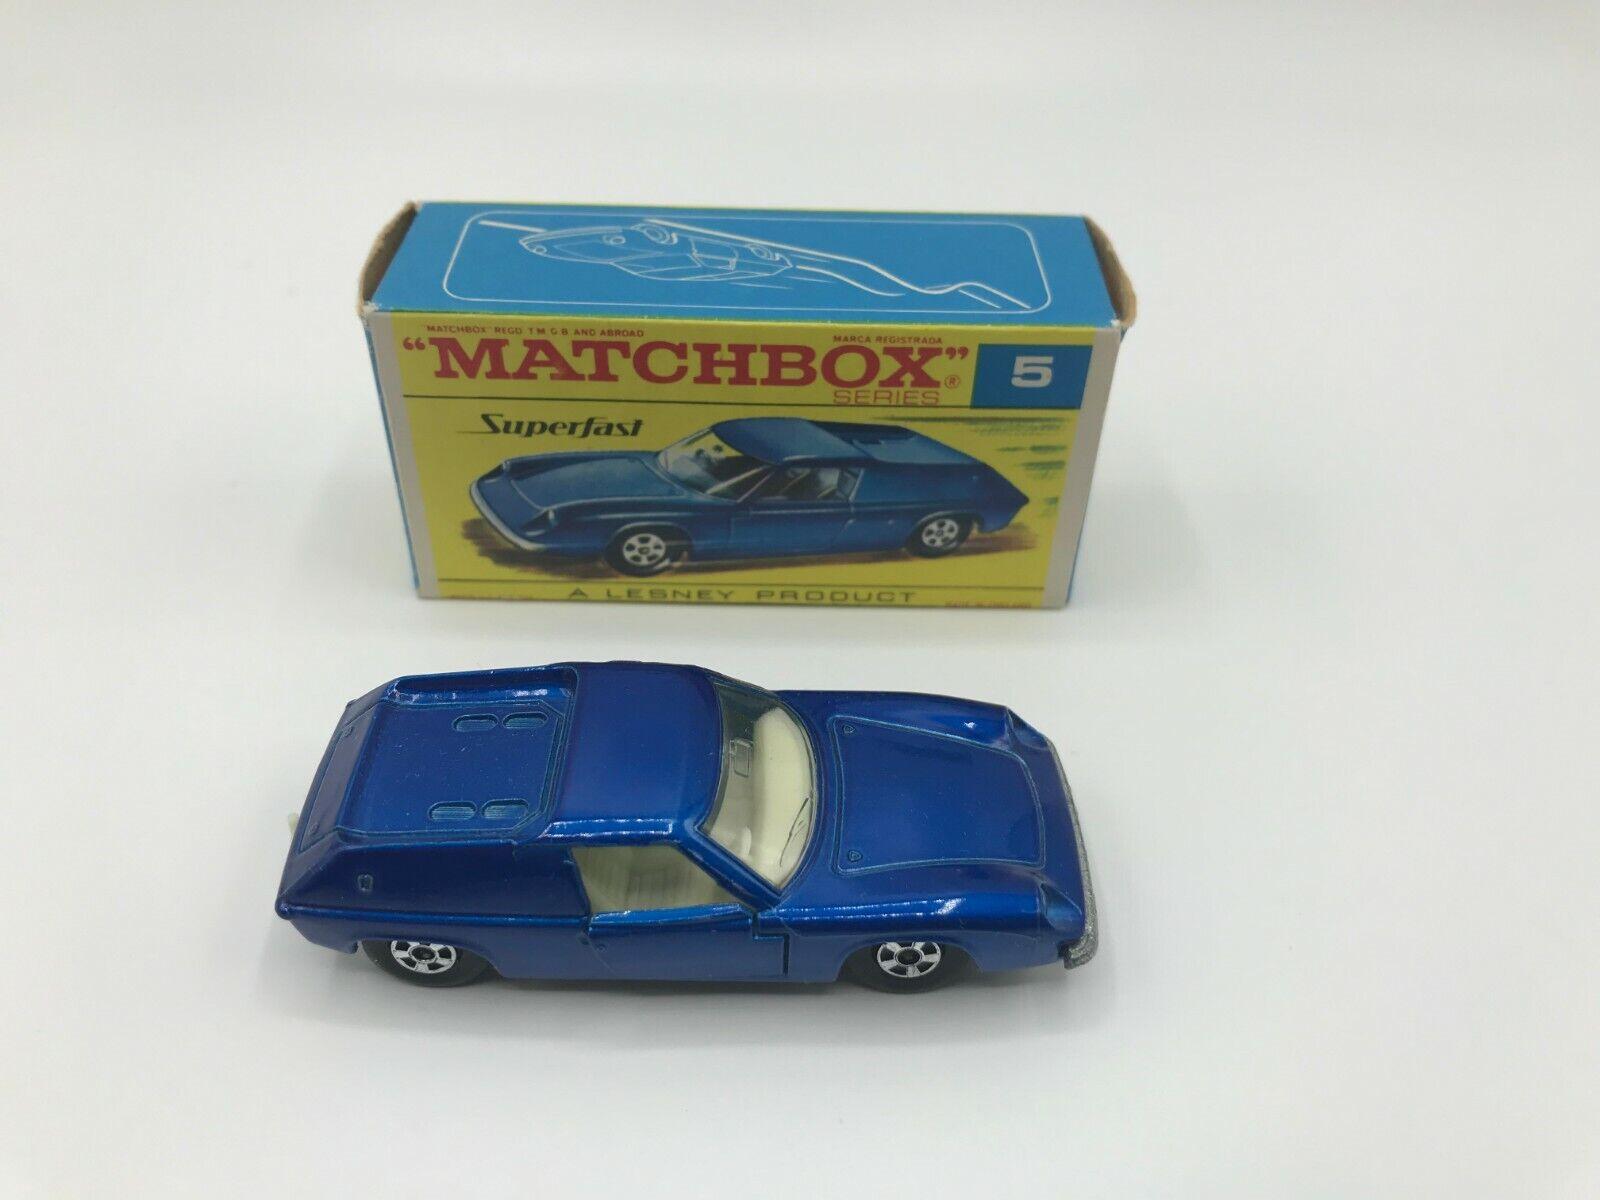 Matchbox Superfast Lotus Europa  5 In Dark Blau Metallic Mint In Original G2 Box